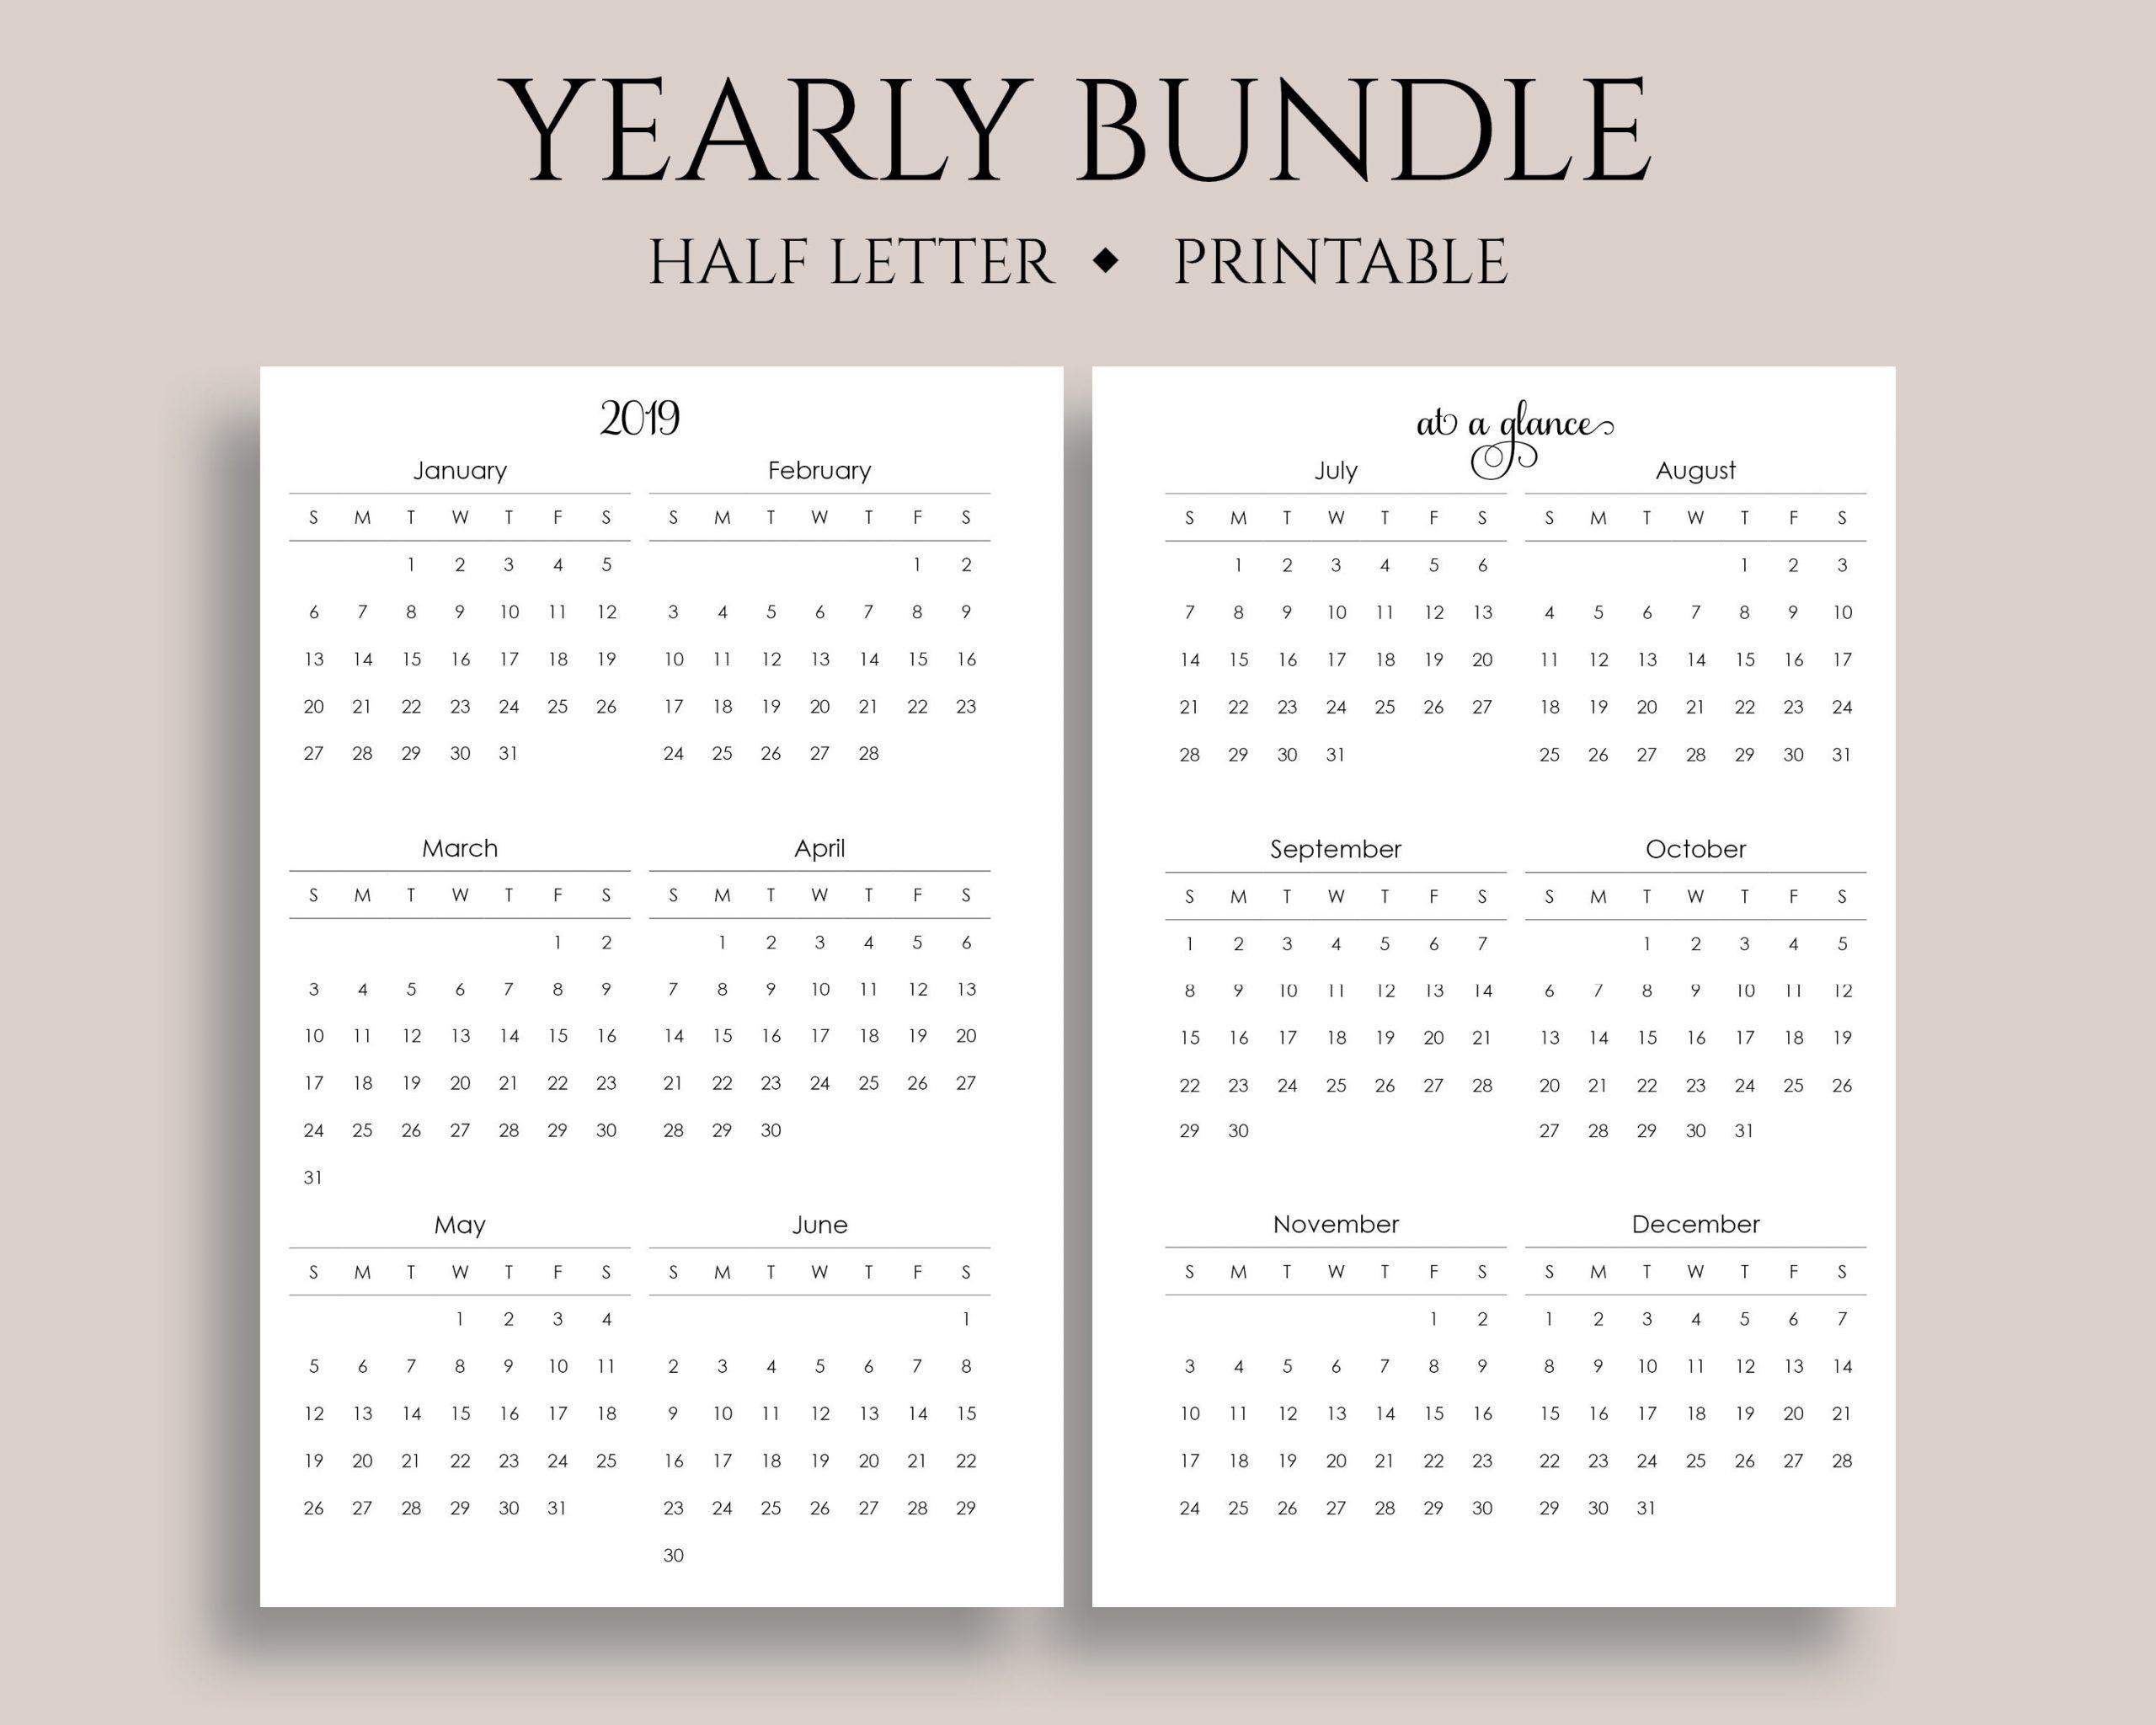 8 5 X 11 2020 Yearly Calendar Printable Calendar